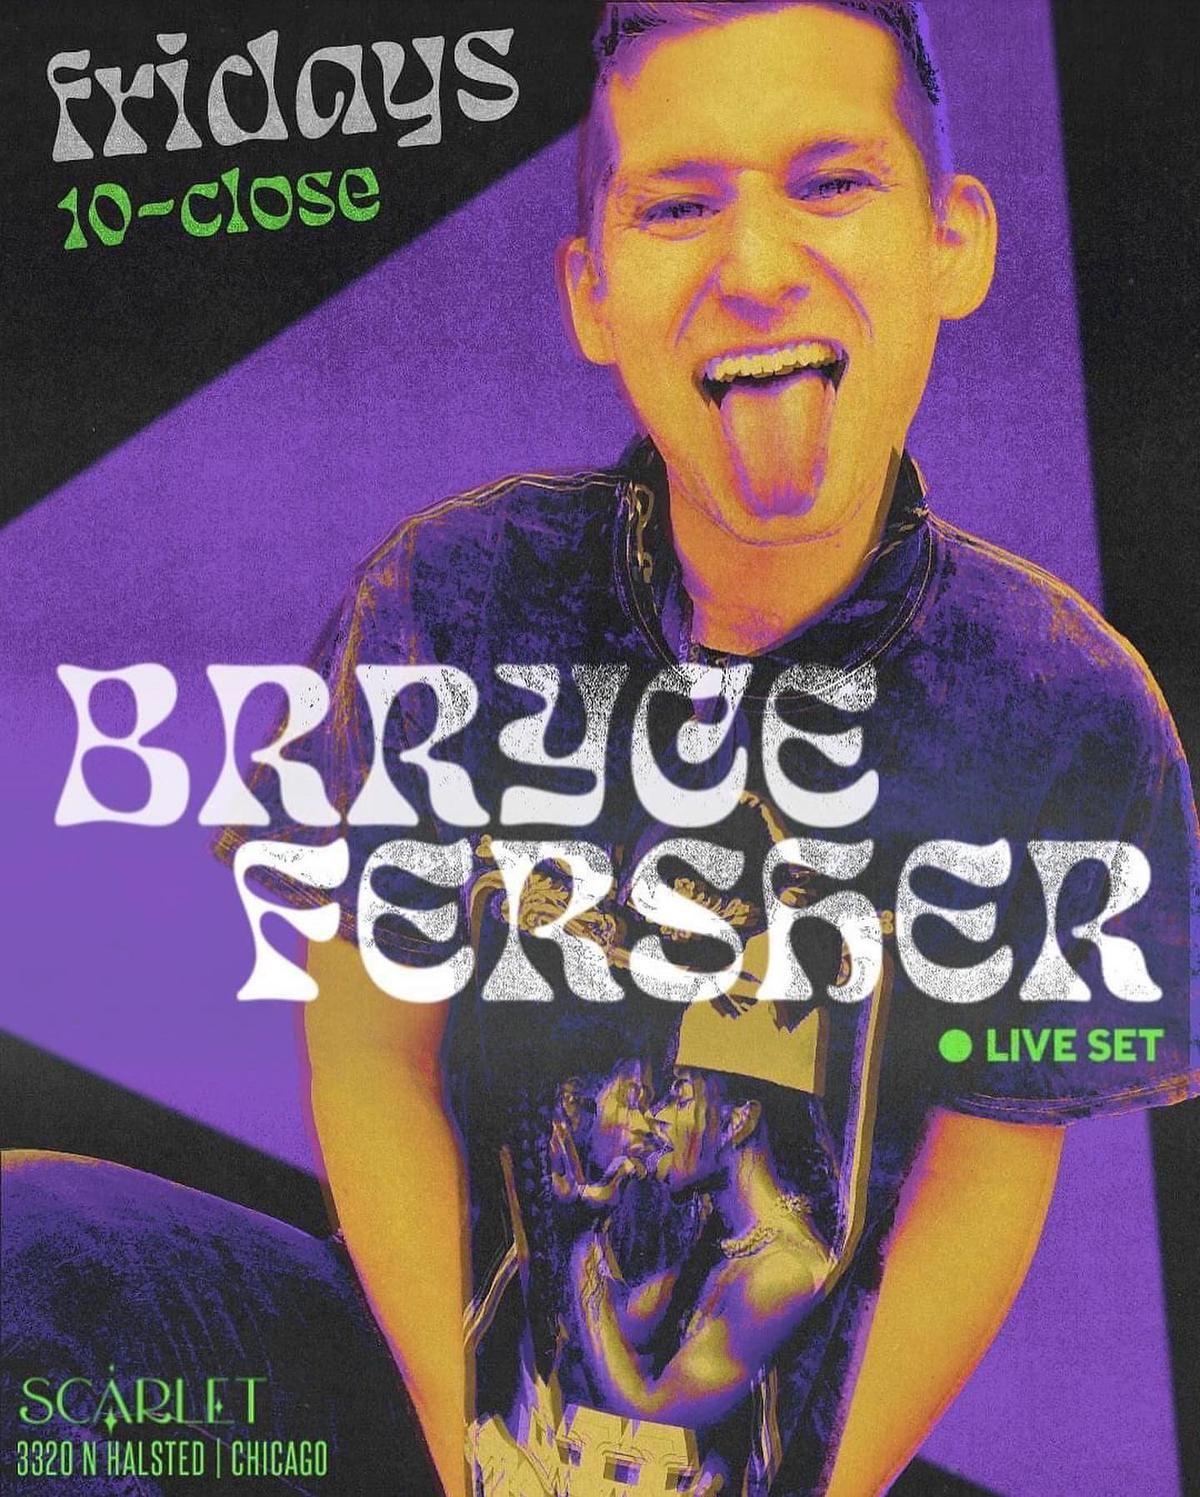 DJ Brryce Fersher at Scarlet